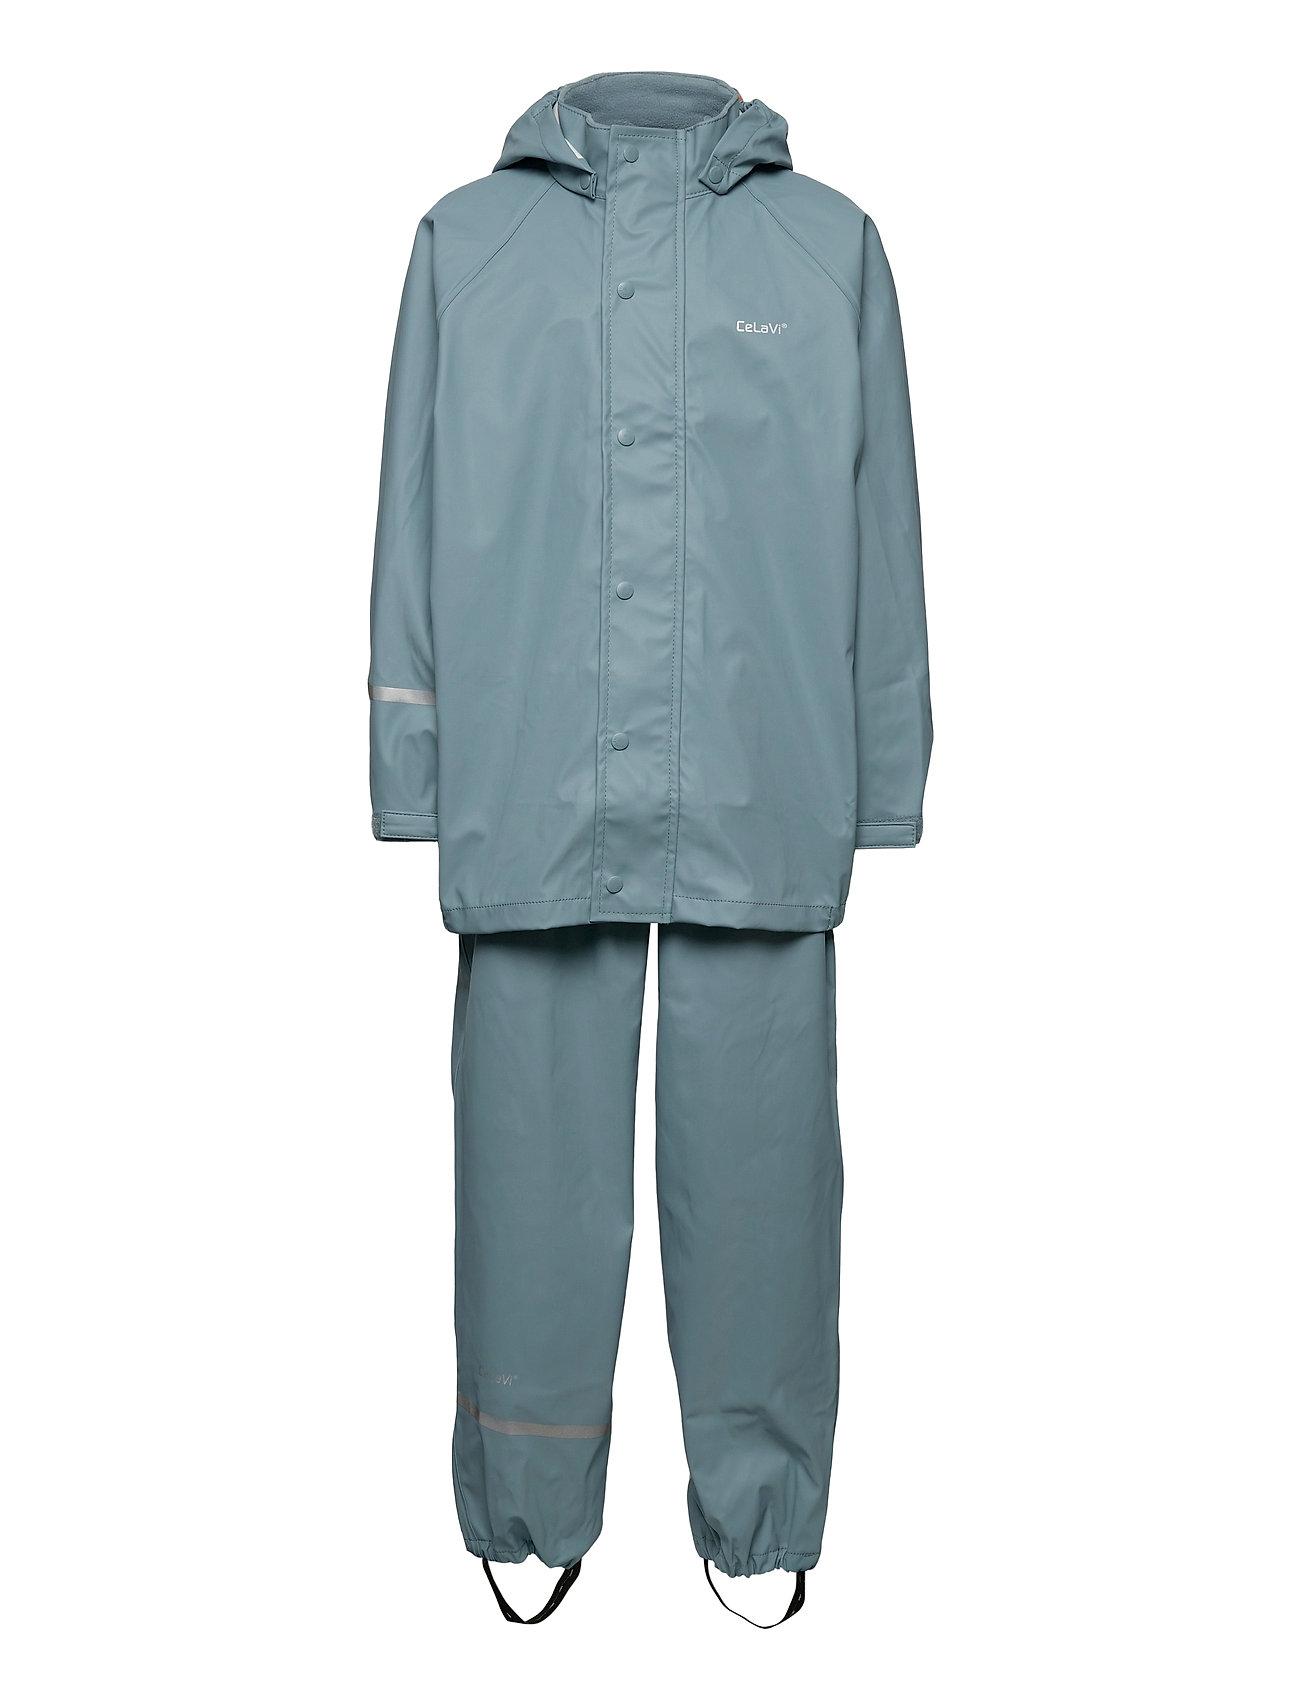 Image of Basci Rainwear Set, Solid Regntøj Blå CeLaVi (3452244669)